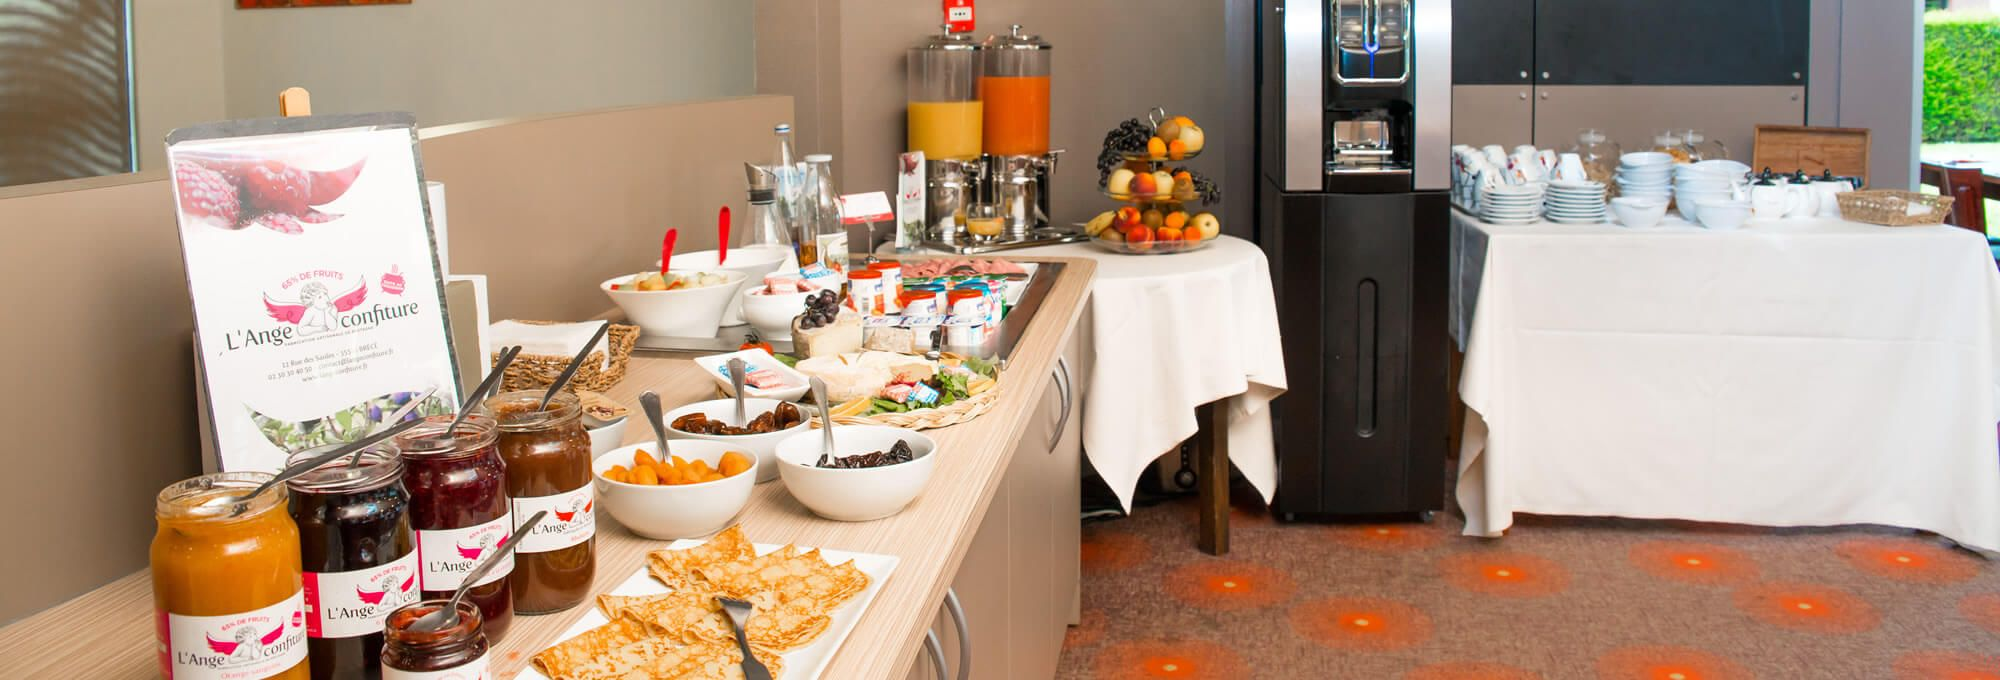 Breakfast at the hotel near Rennes, in Saint-Grégoire.